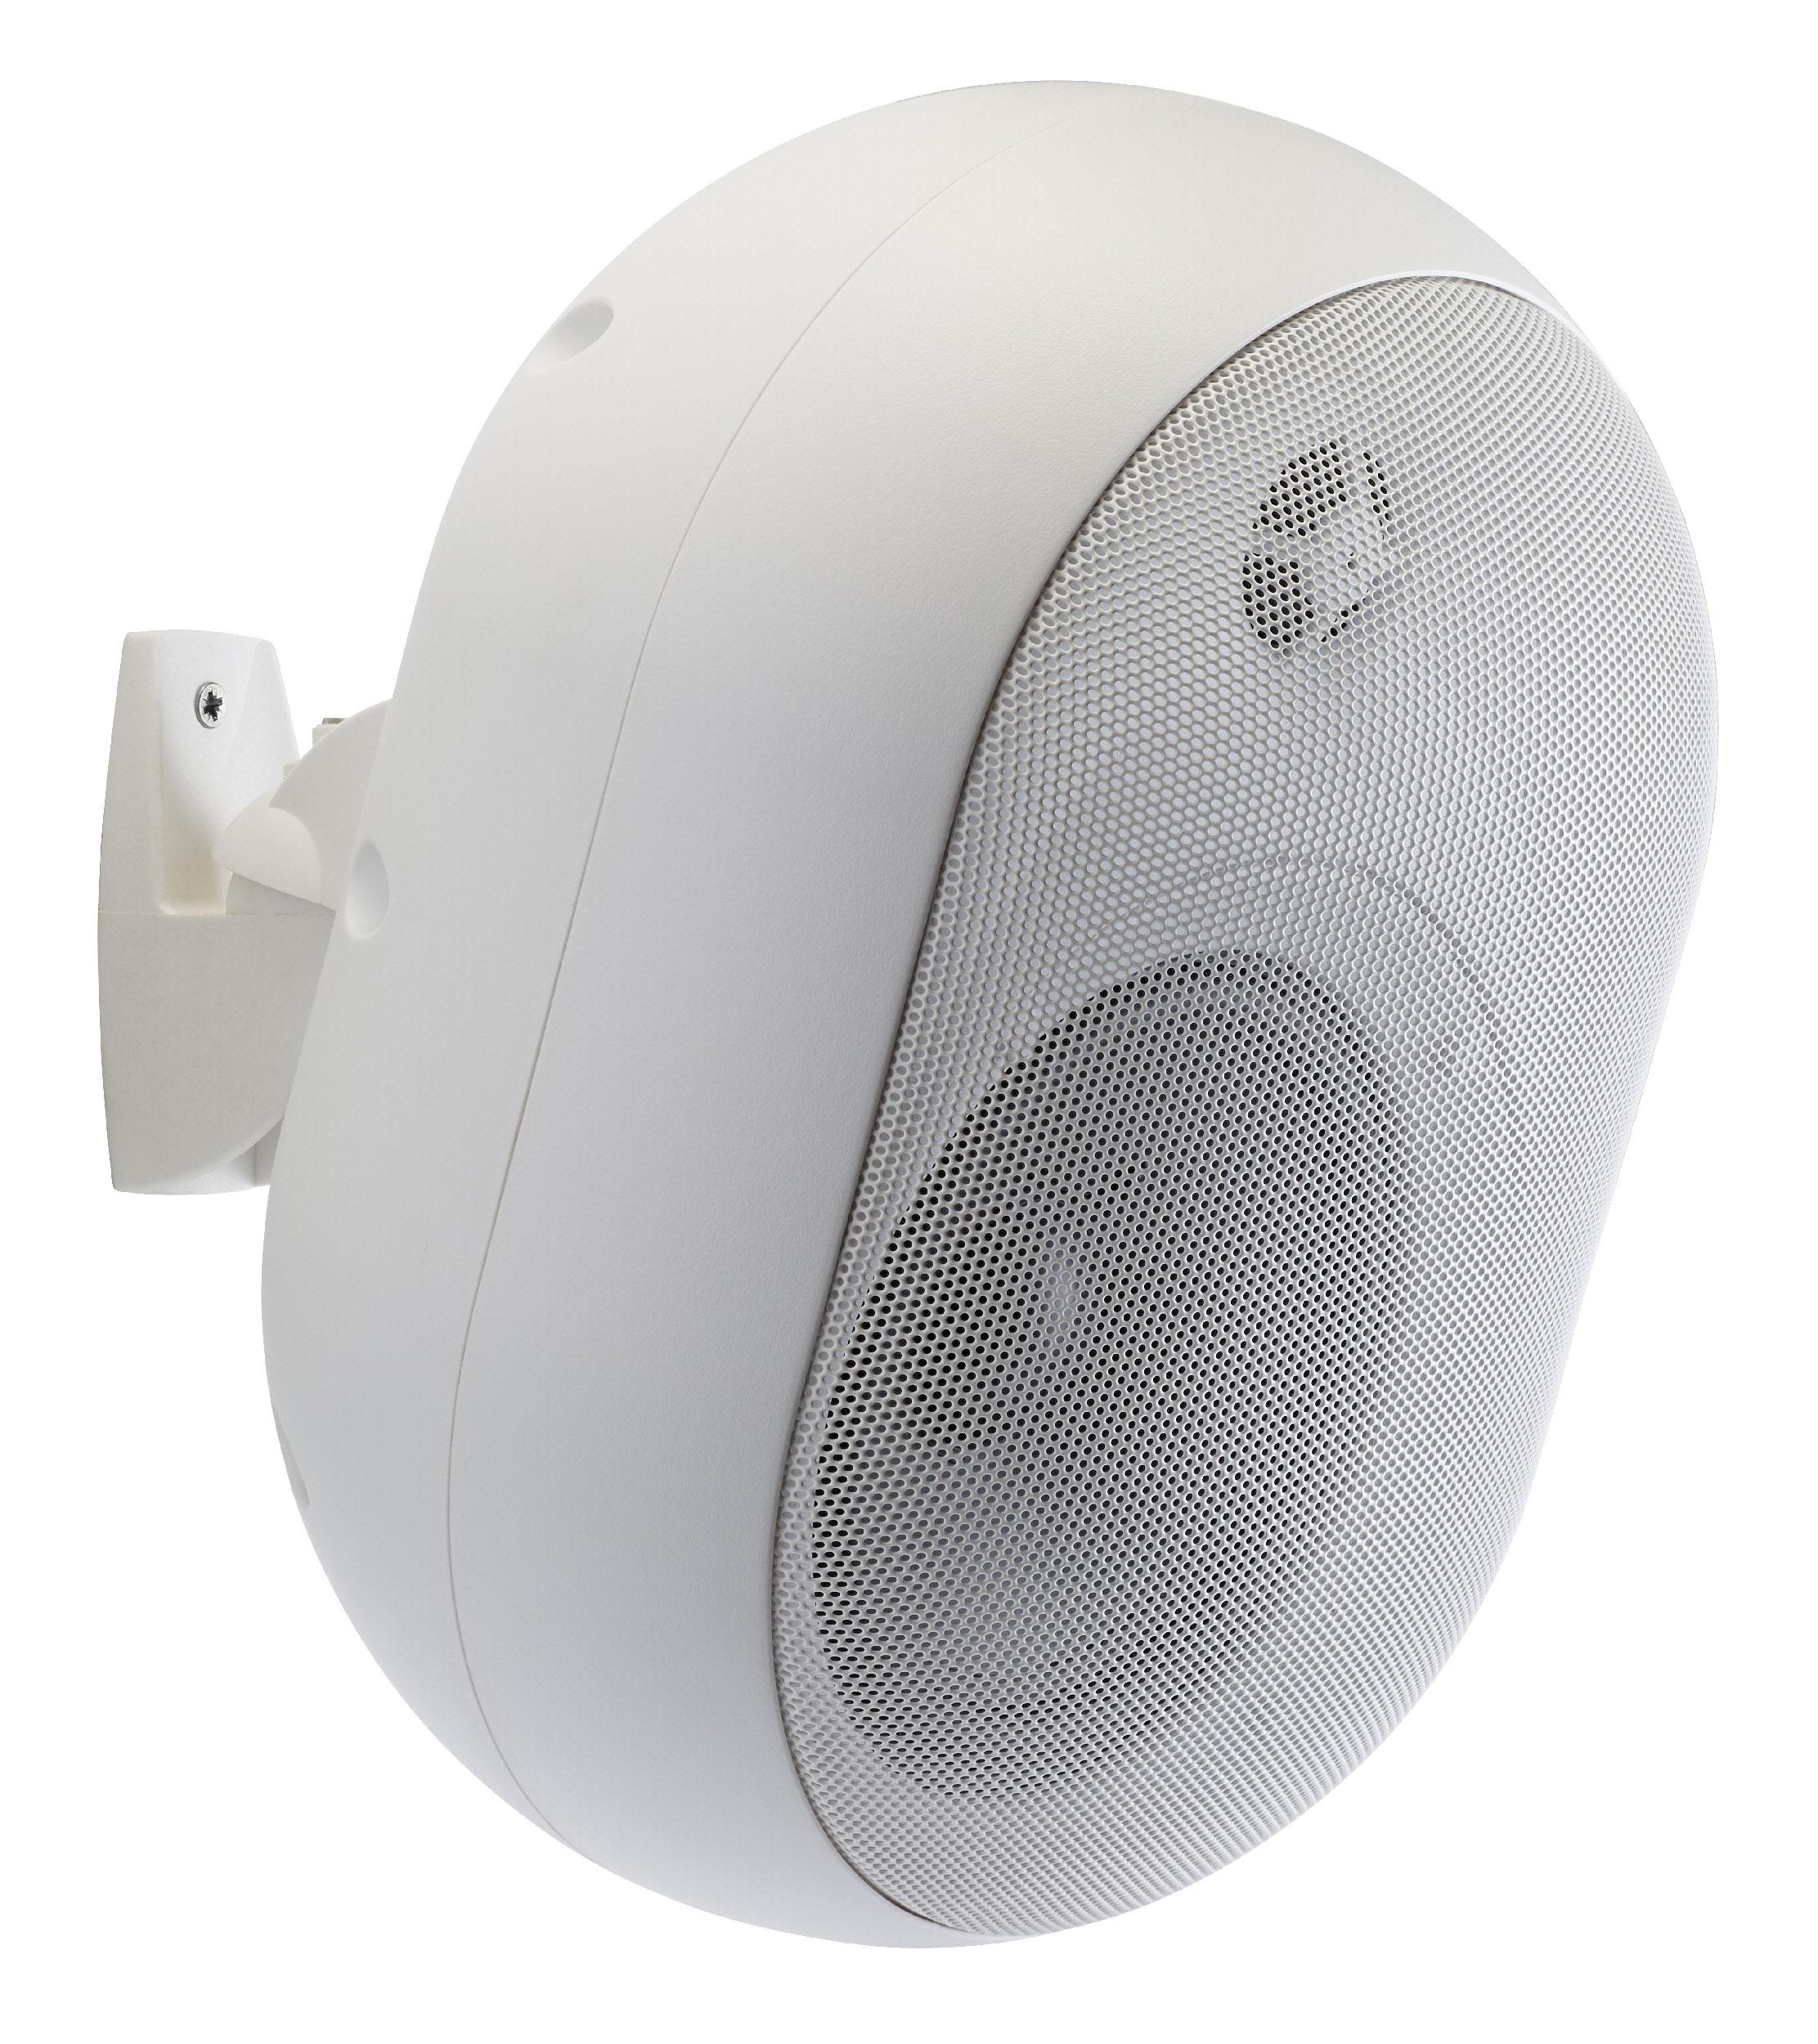 Tropicalized speaker 100V 15~30W 16 Ohms - White - IP55